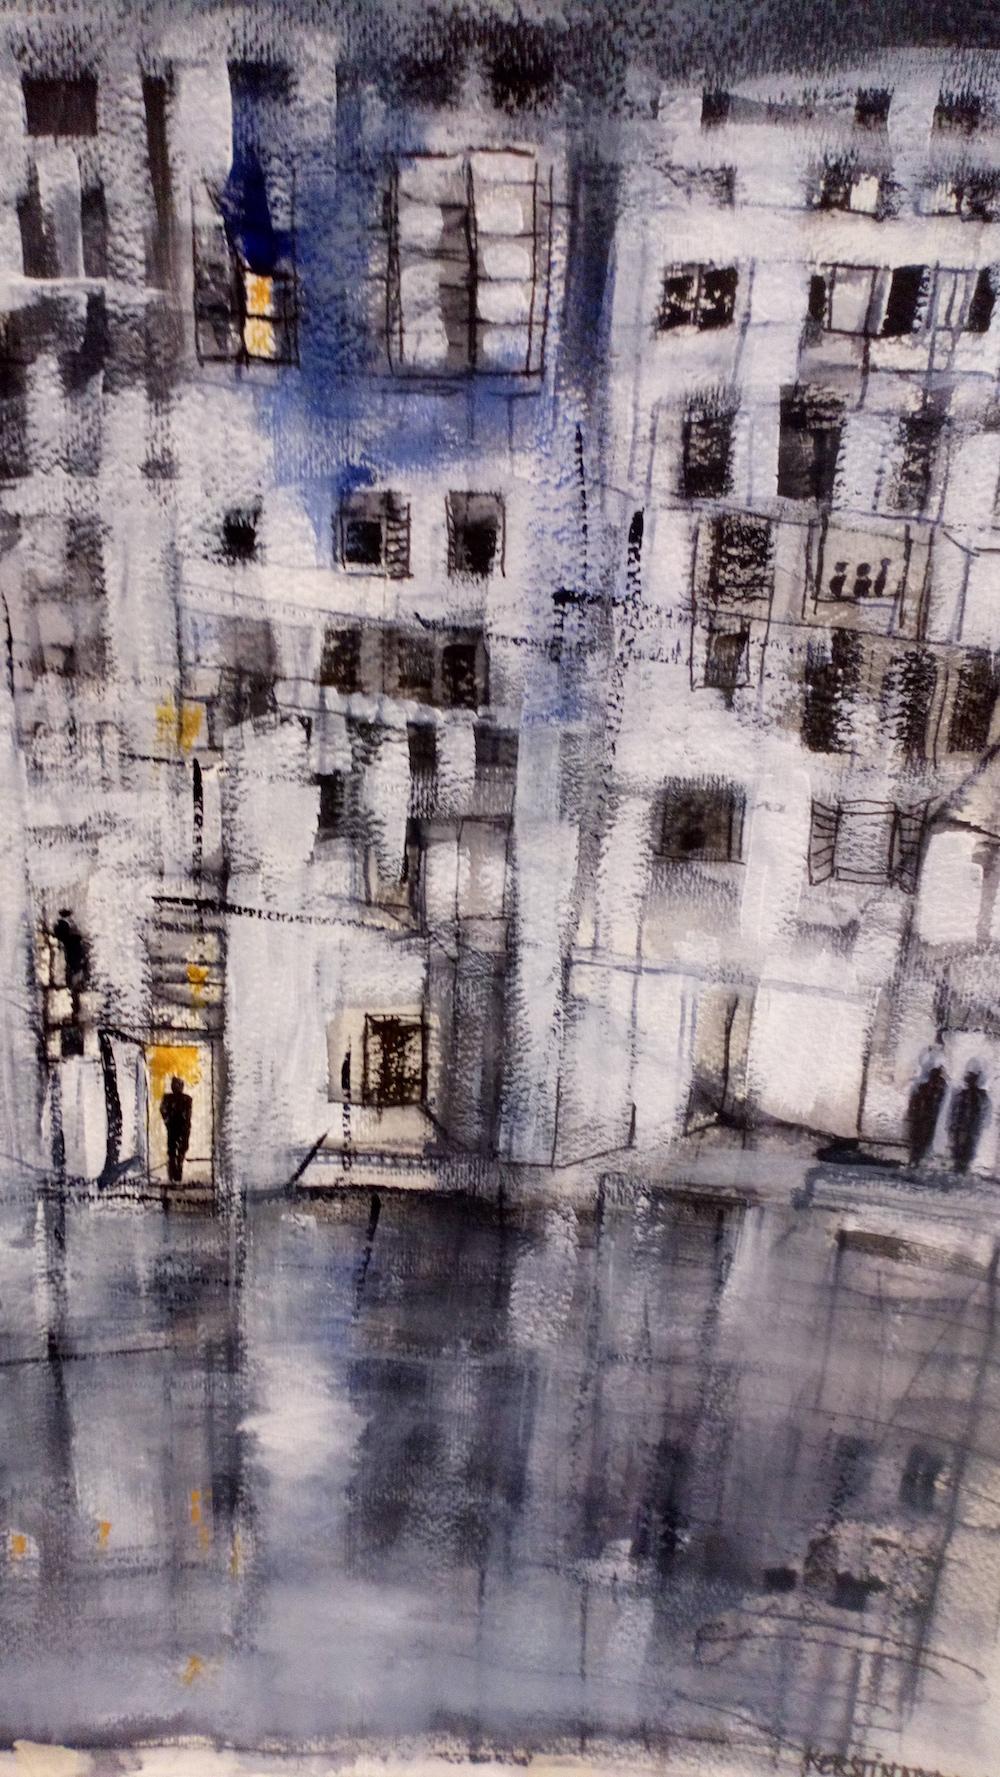 Kerstin Nyman Måleri | Tusch, akryl på akvarellpapper 60 x 80 cm 4 000 kr svenskakonstnarer.se